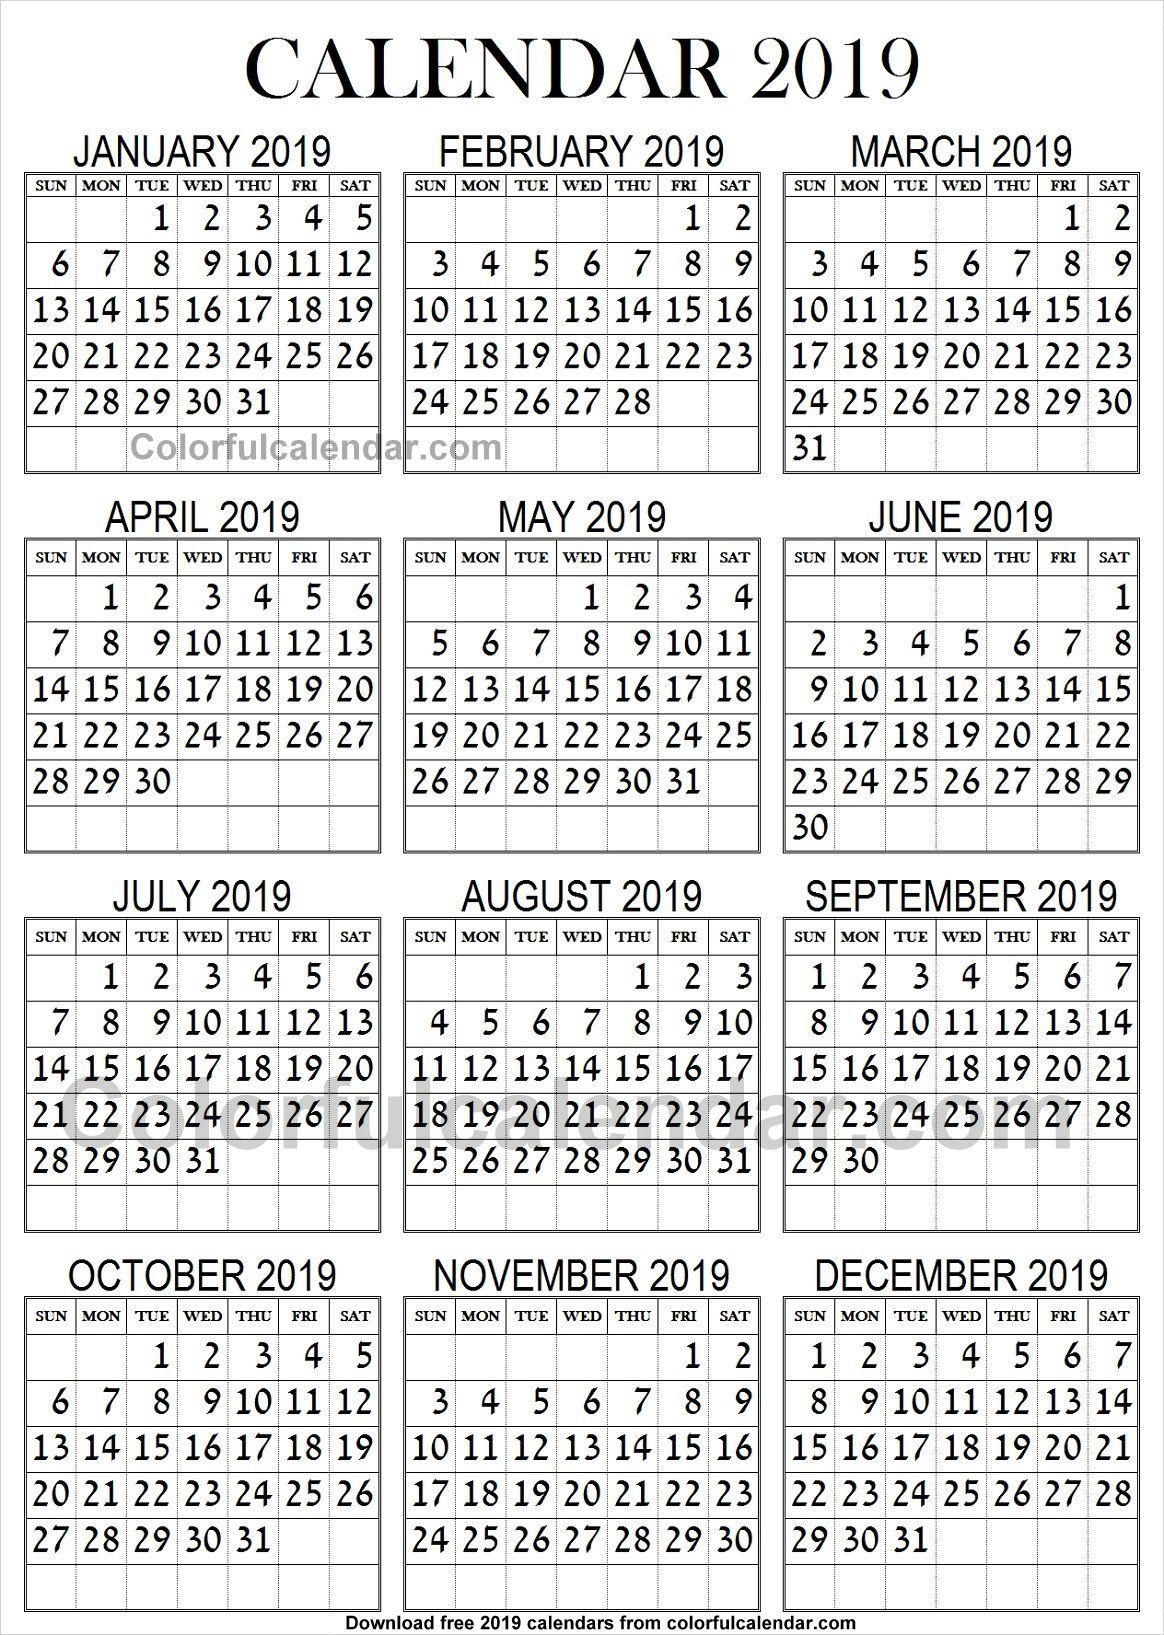 2019 Calendar Large Print | Large Prints, 2019 Calendar